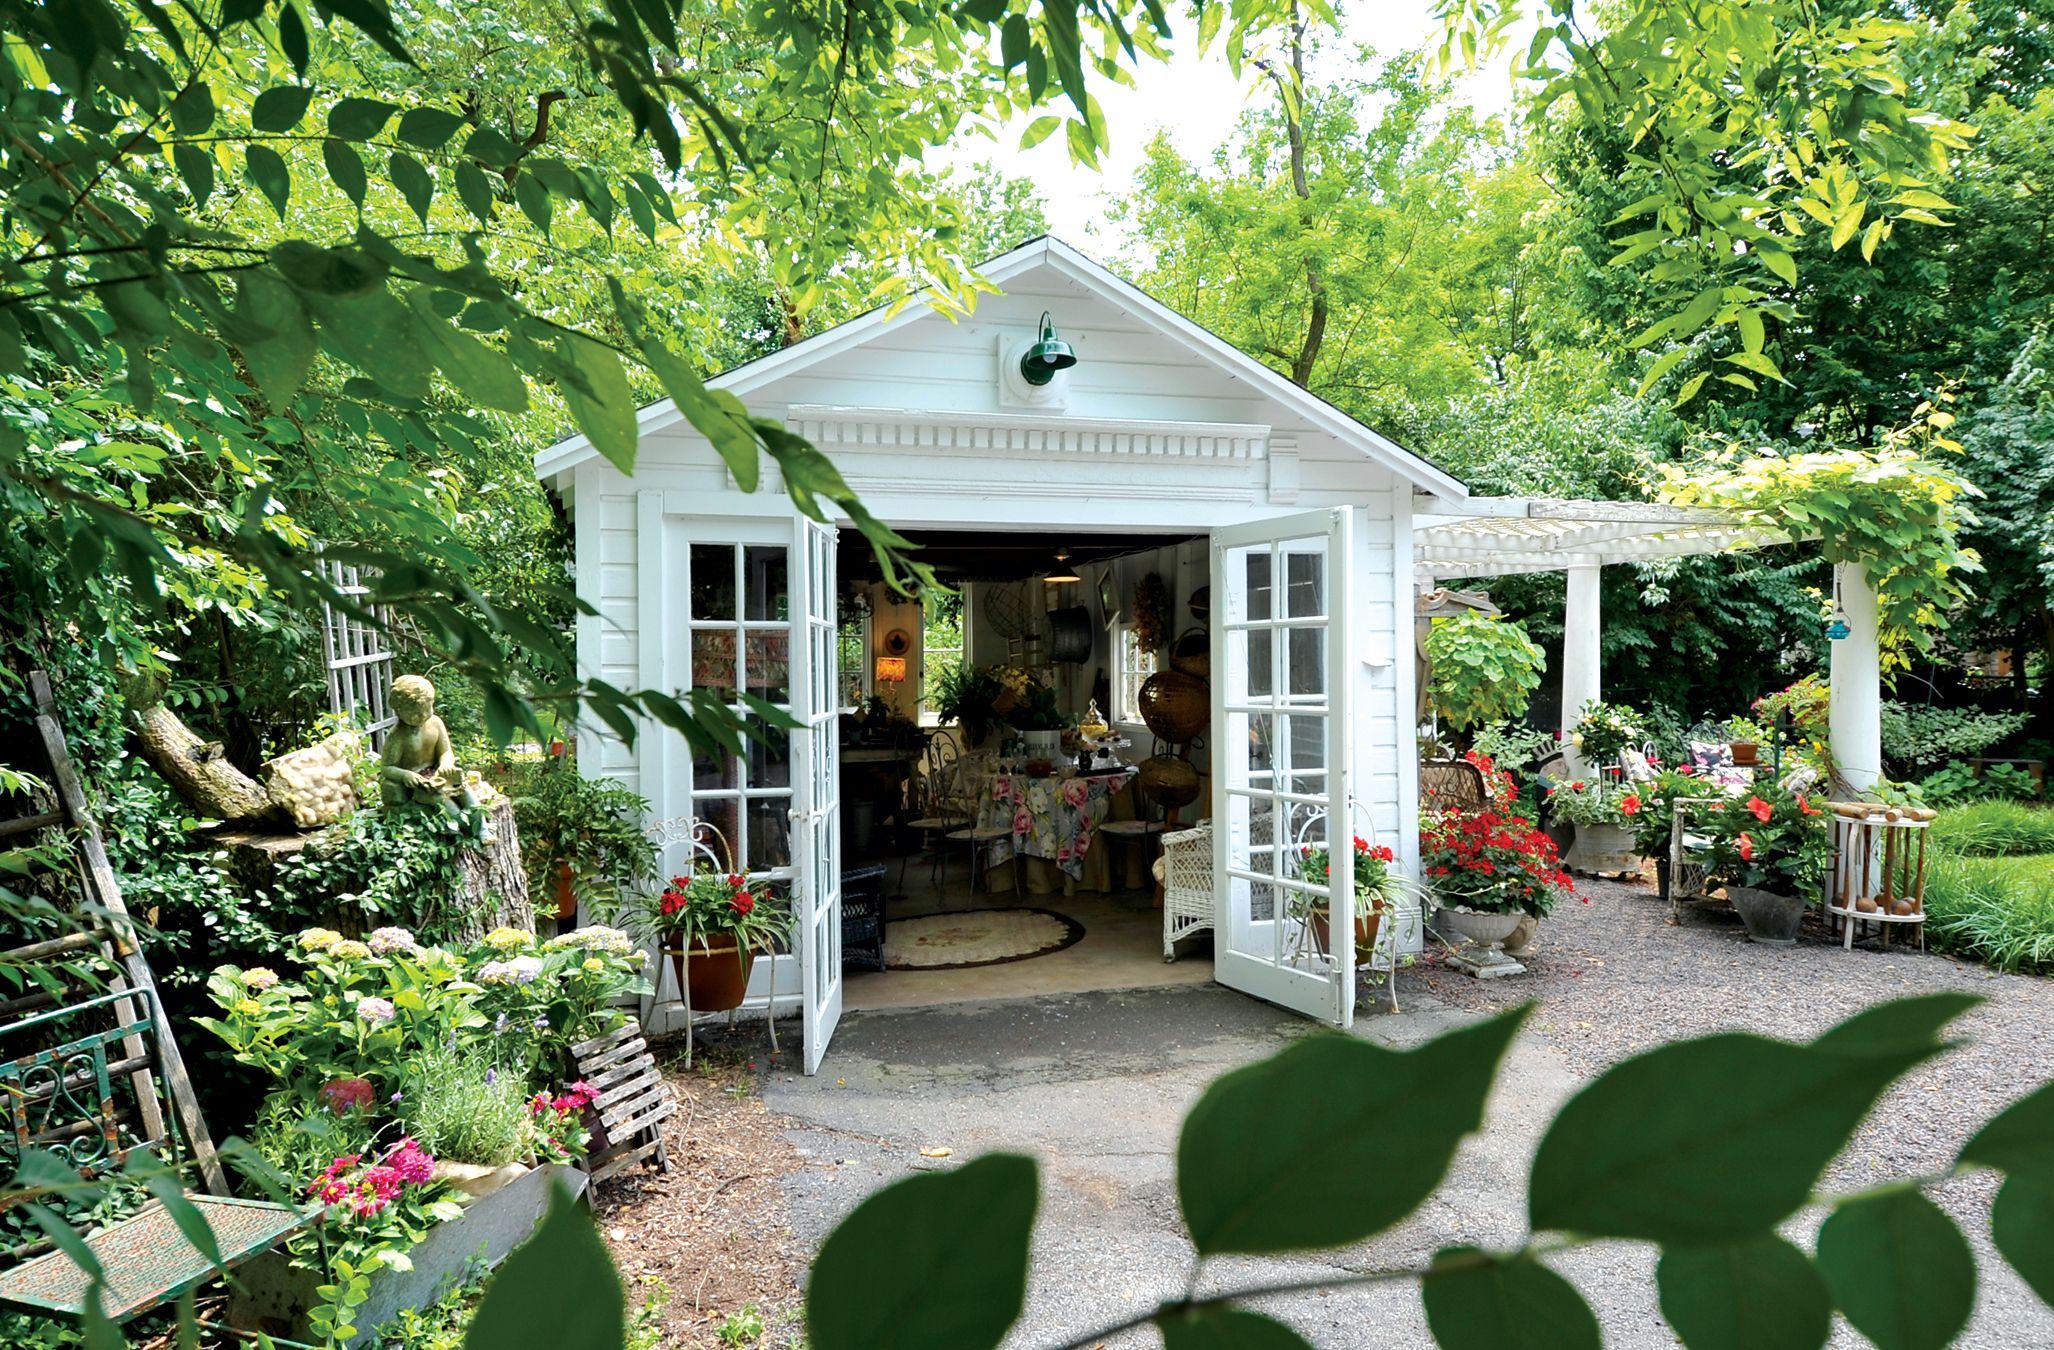 Garden House with Pergola | Backyard cottage, Backyard ...